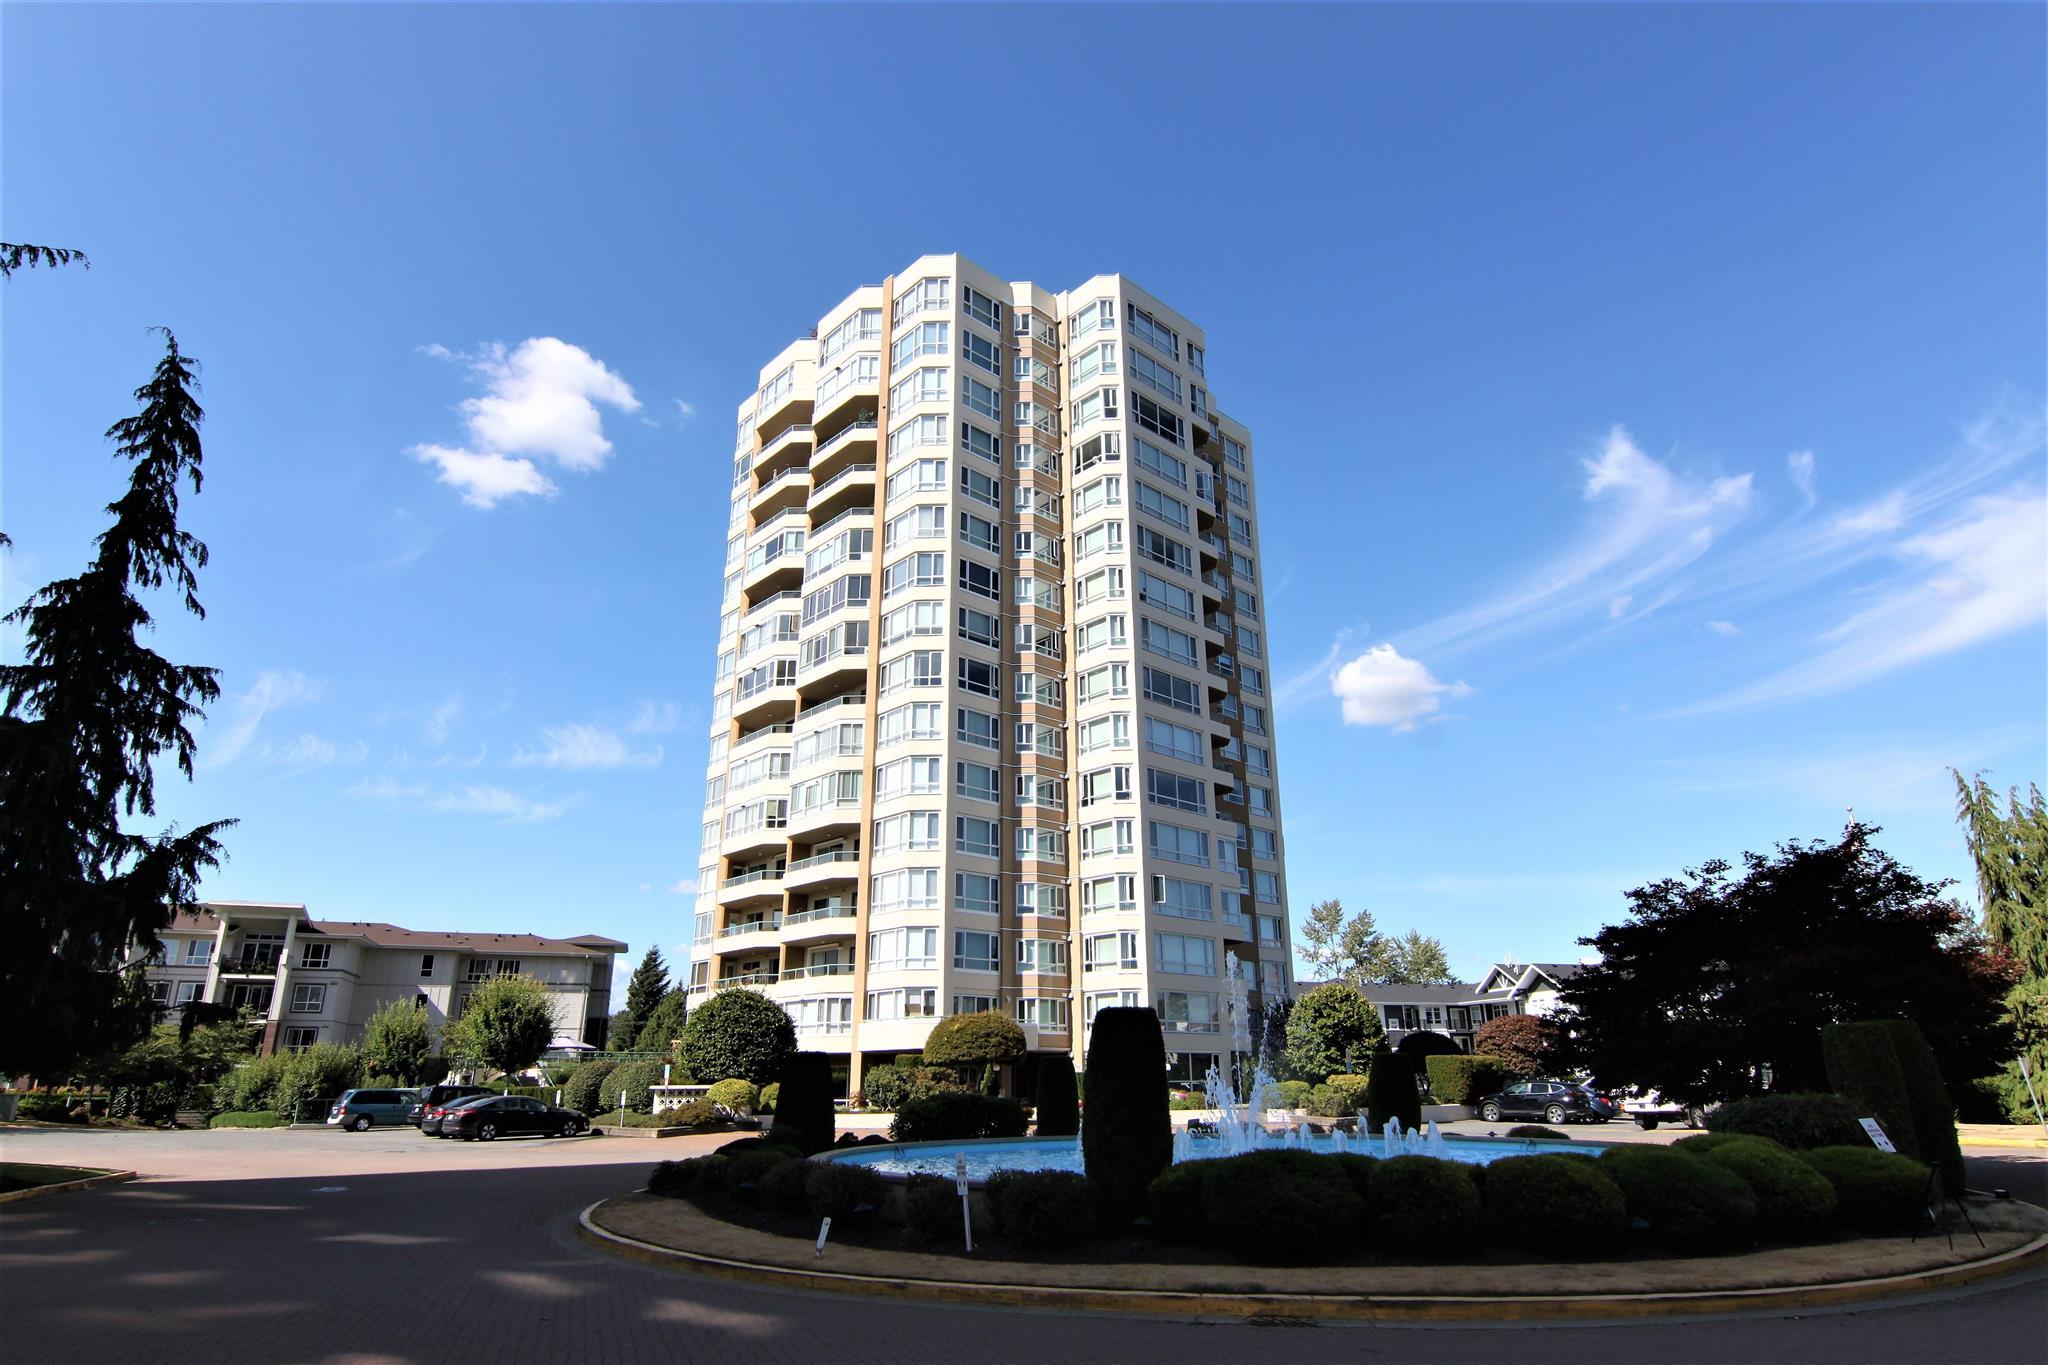 102 3190 GLADWIN ROAD - Central Abbotsford Apartment/Condo for sale, 2 Bedrooms (R2604373) - #1